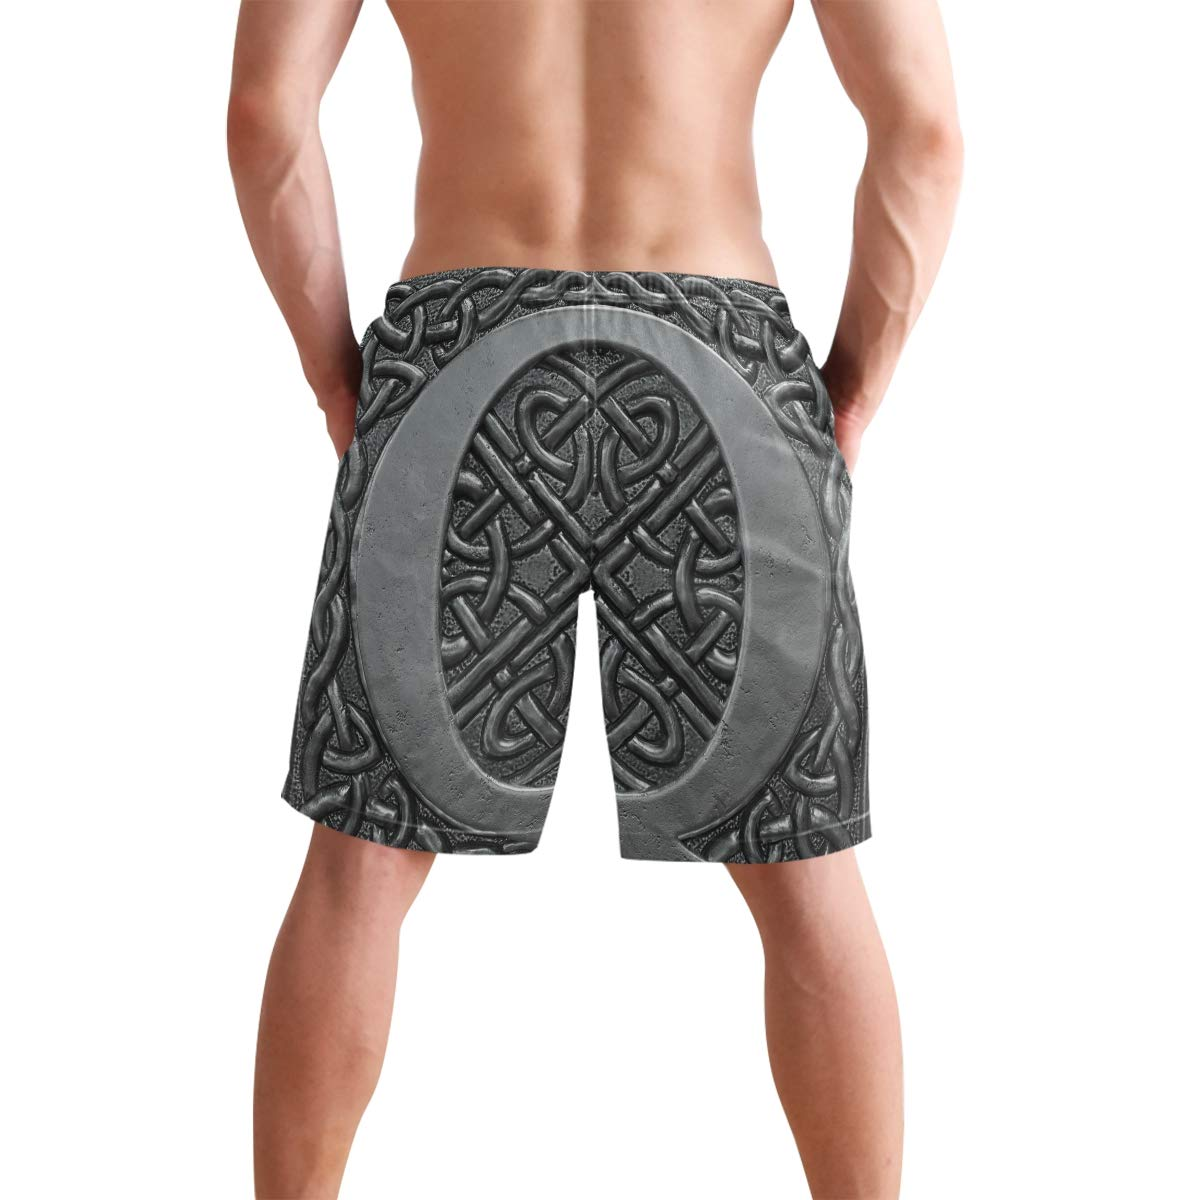 Mens Beach Swim Trunks Vintage 3D Letter Q Boxer Swimsuit Underwear Board Shorts with Pocket